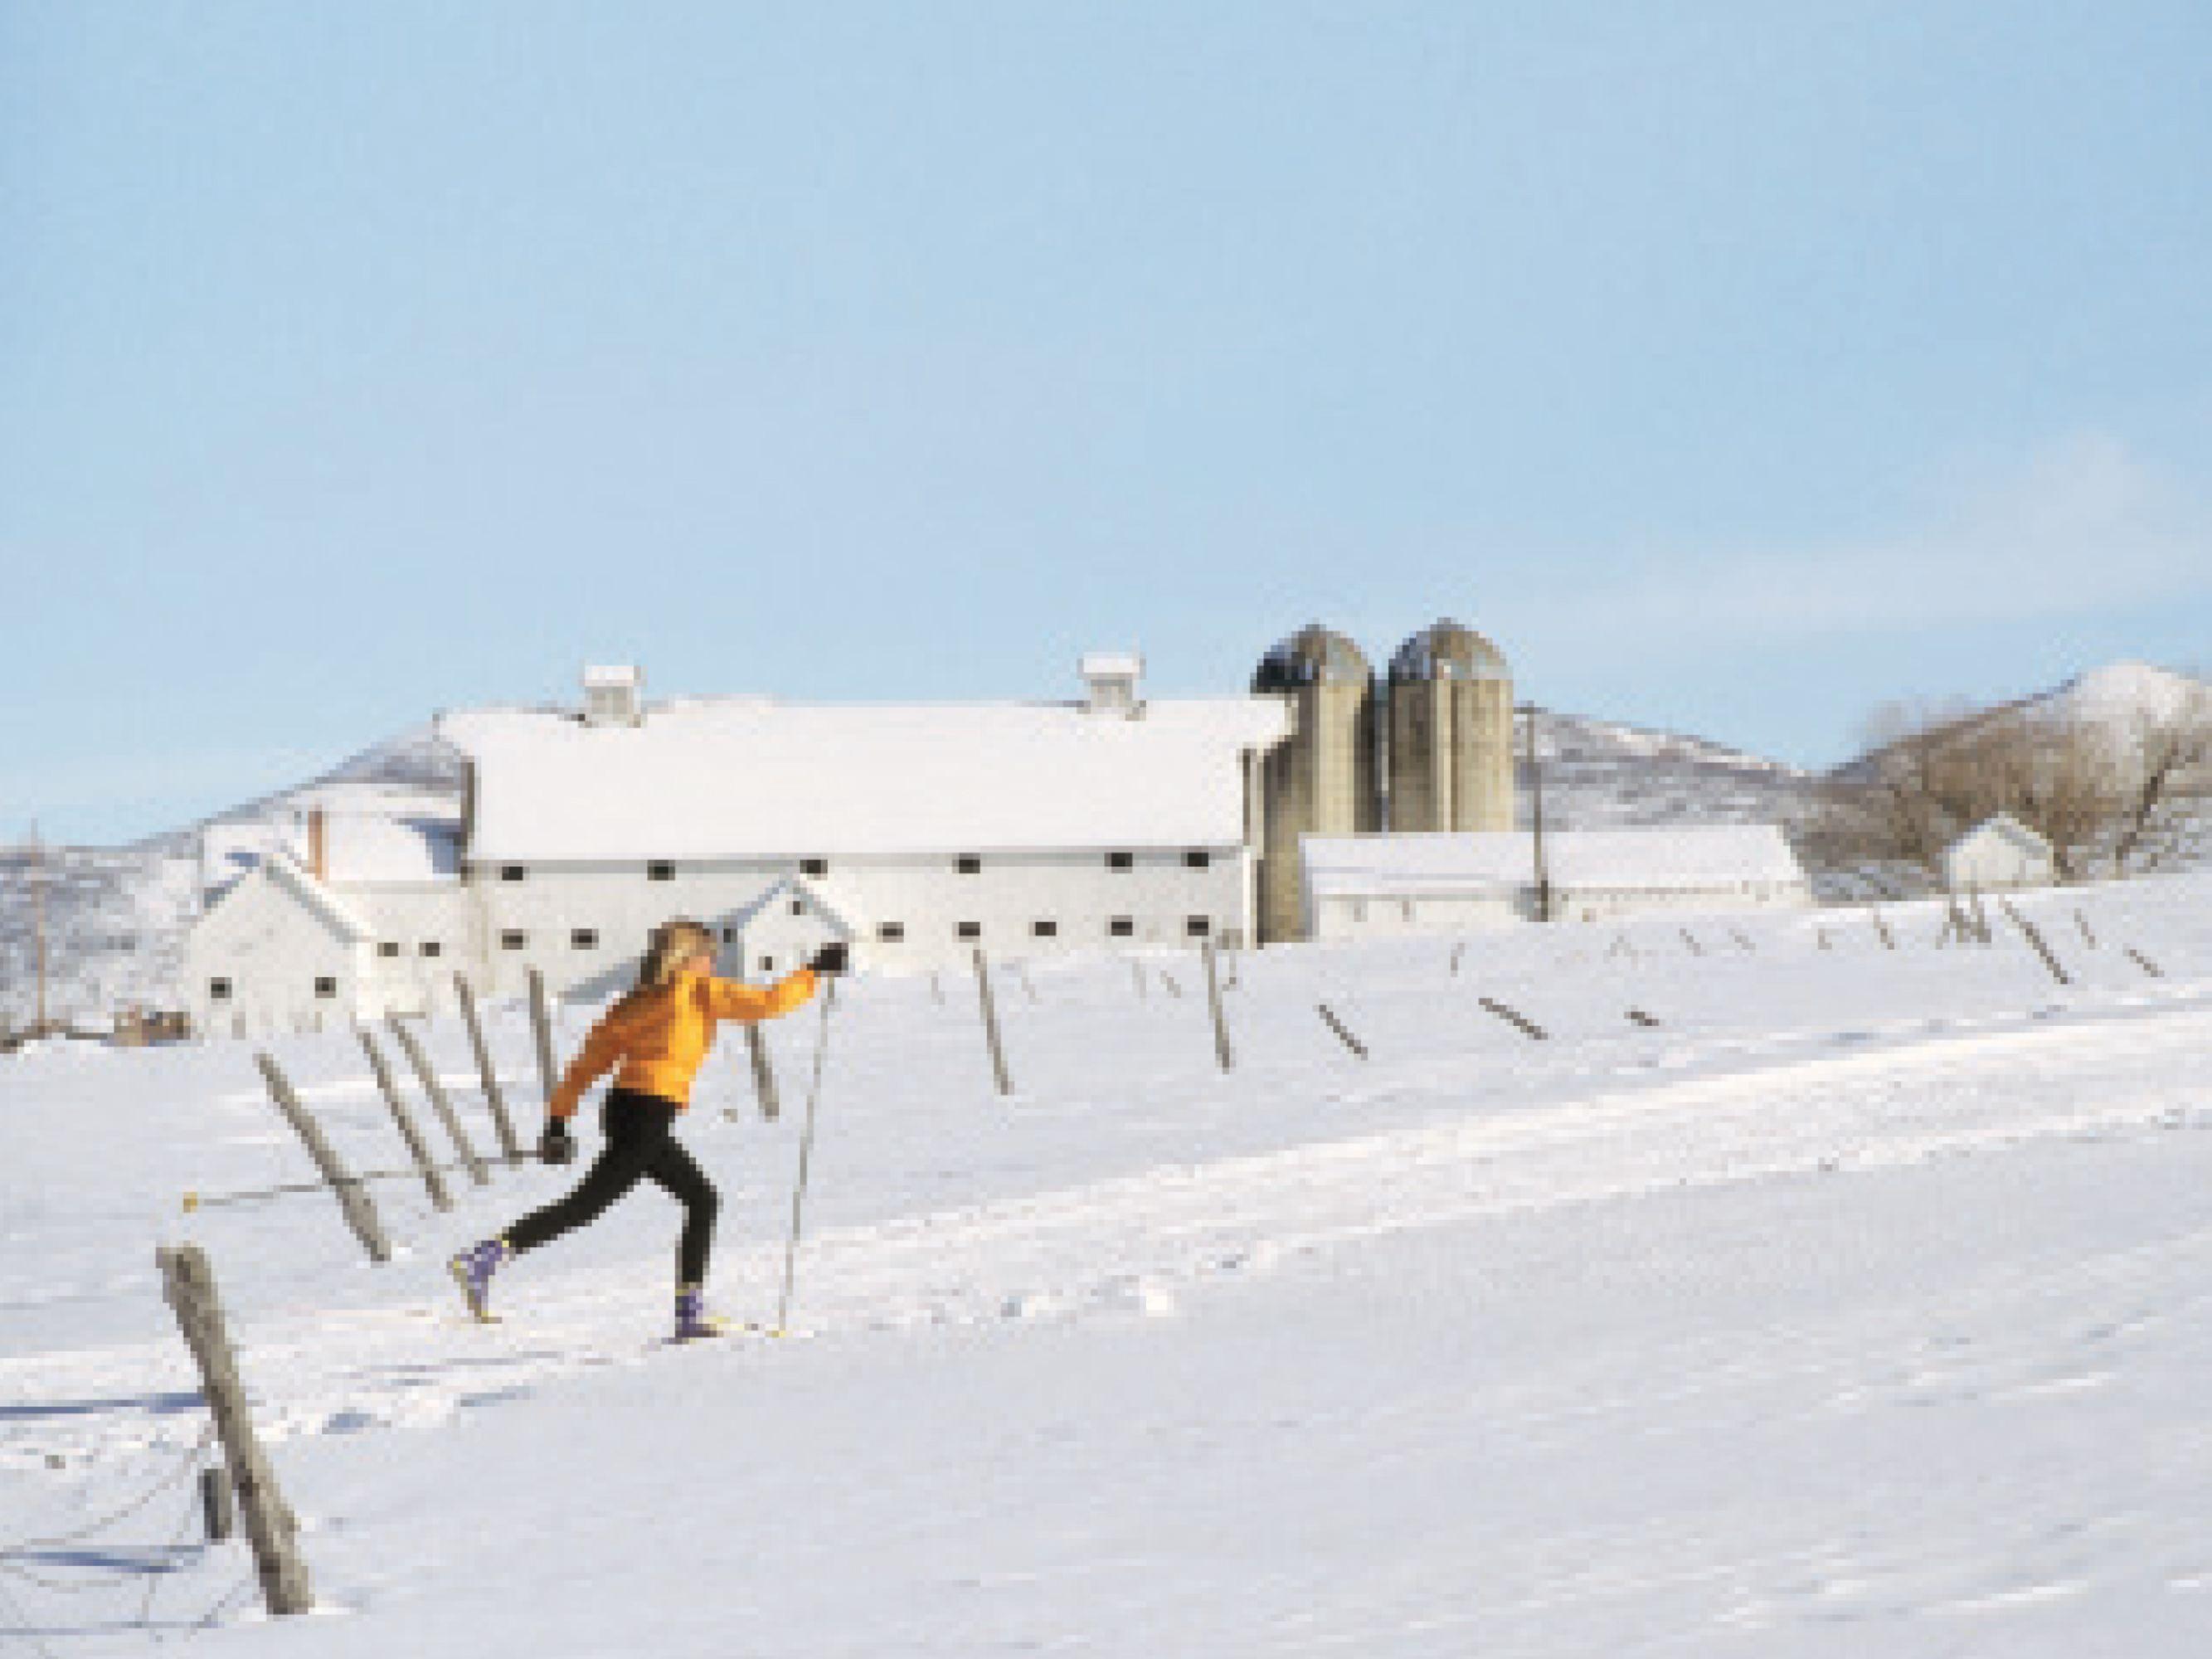 Park city winter 2012 wats your sign nordic skiing norwah